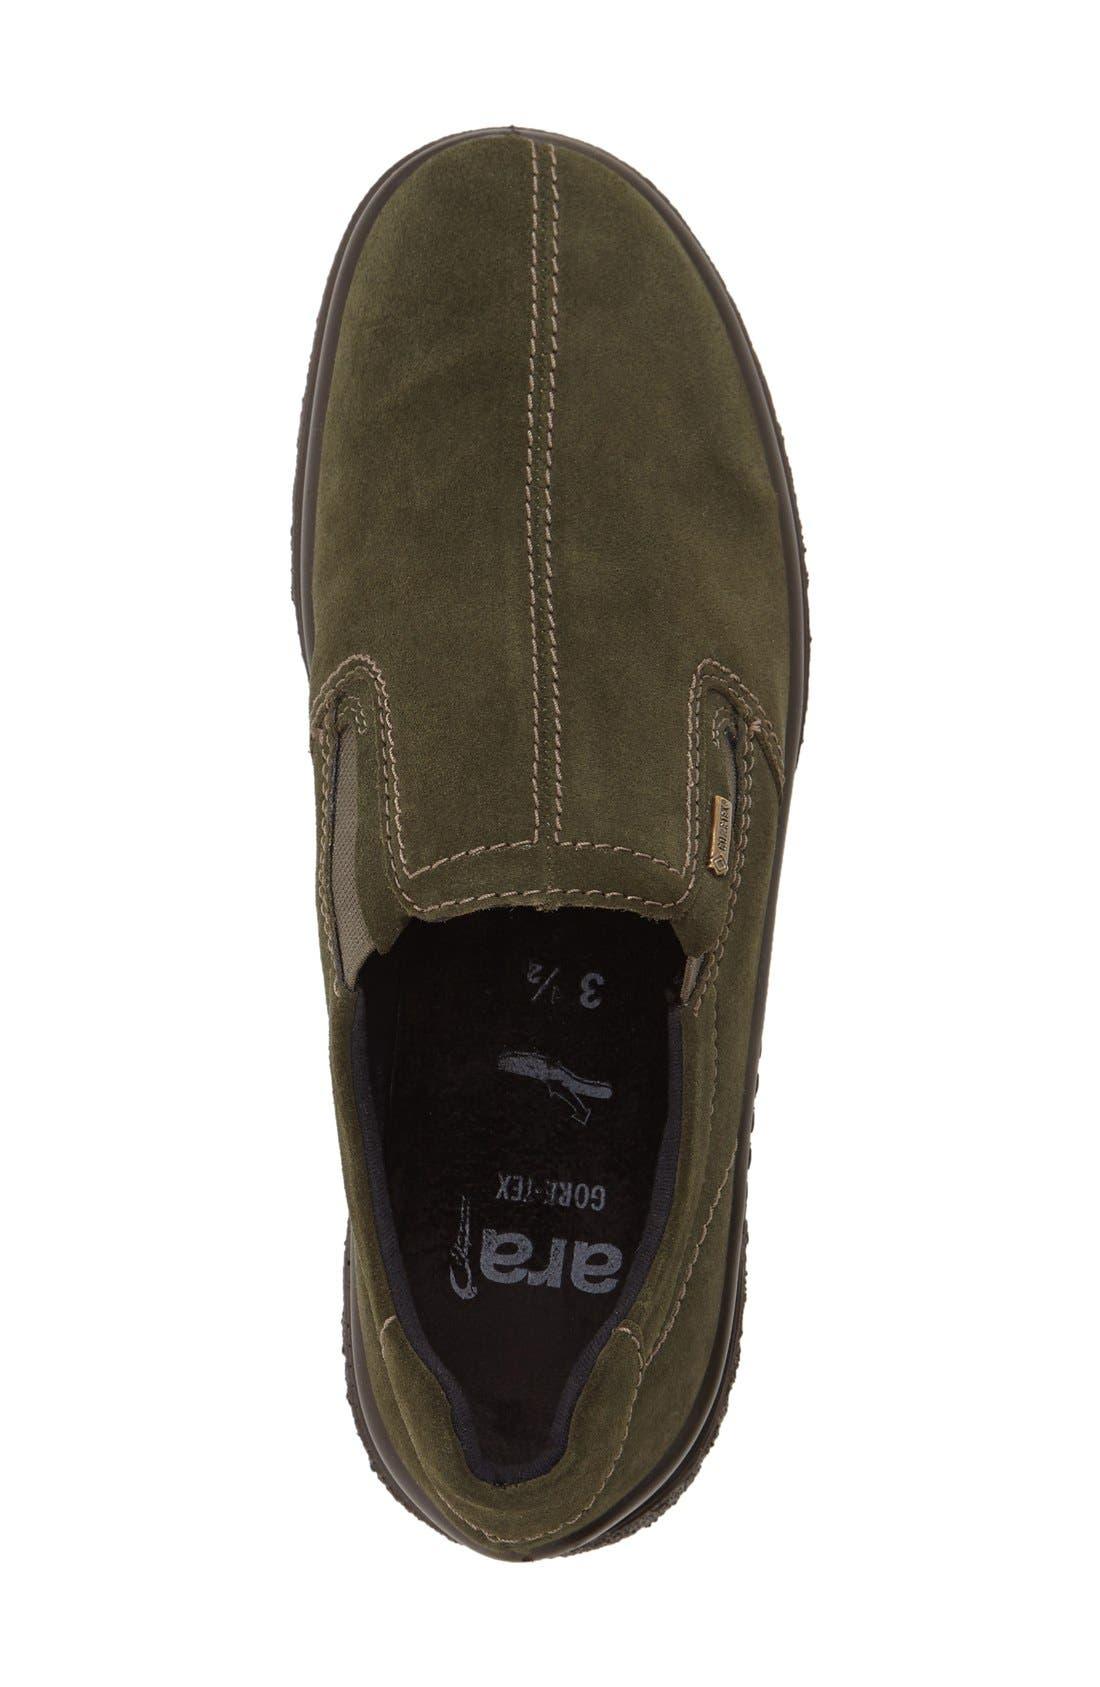 Parson Waterproof Gore-Tex<sup>®</sup> Slip-On Sneaker,                             Alternate thumbnail 3, color,                             Olive Suede